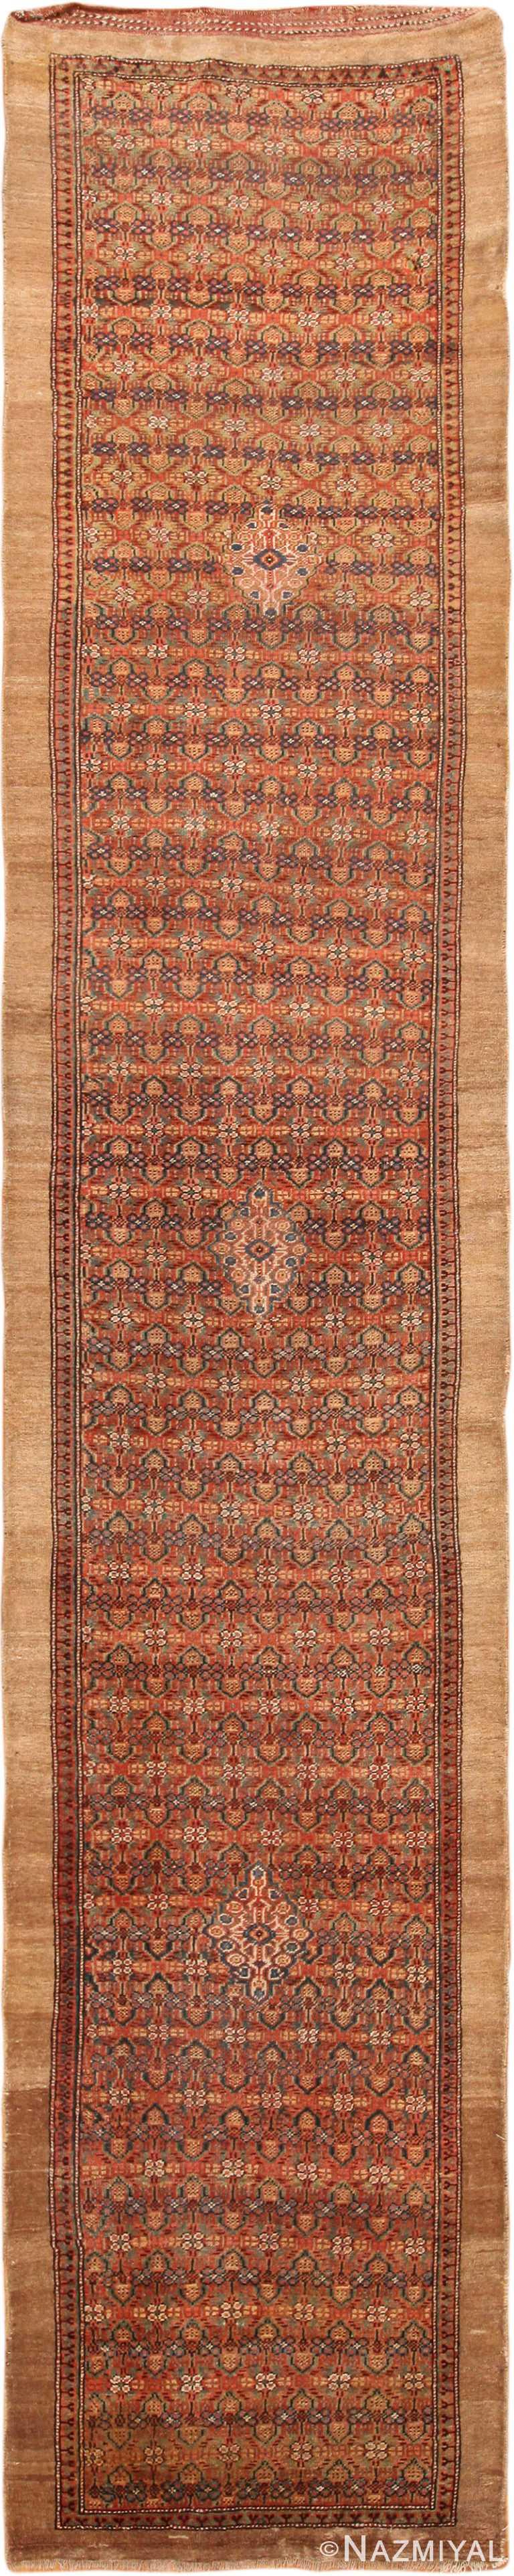 Large Antique Persian Serab Runner 70324 by Nazmiyal NYC